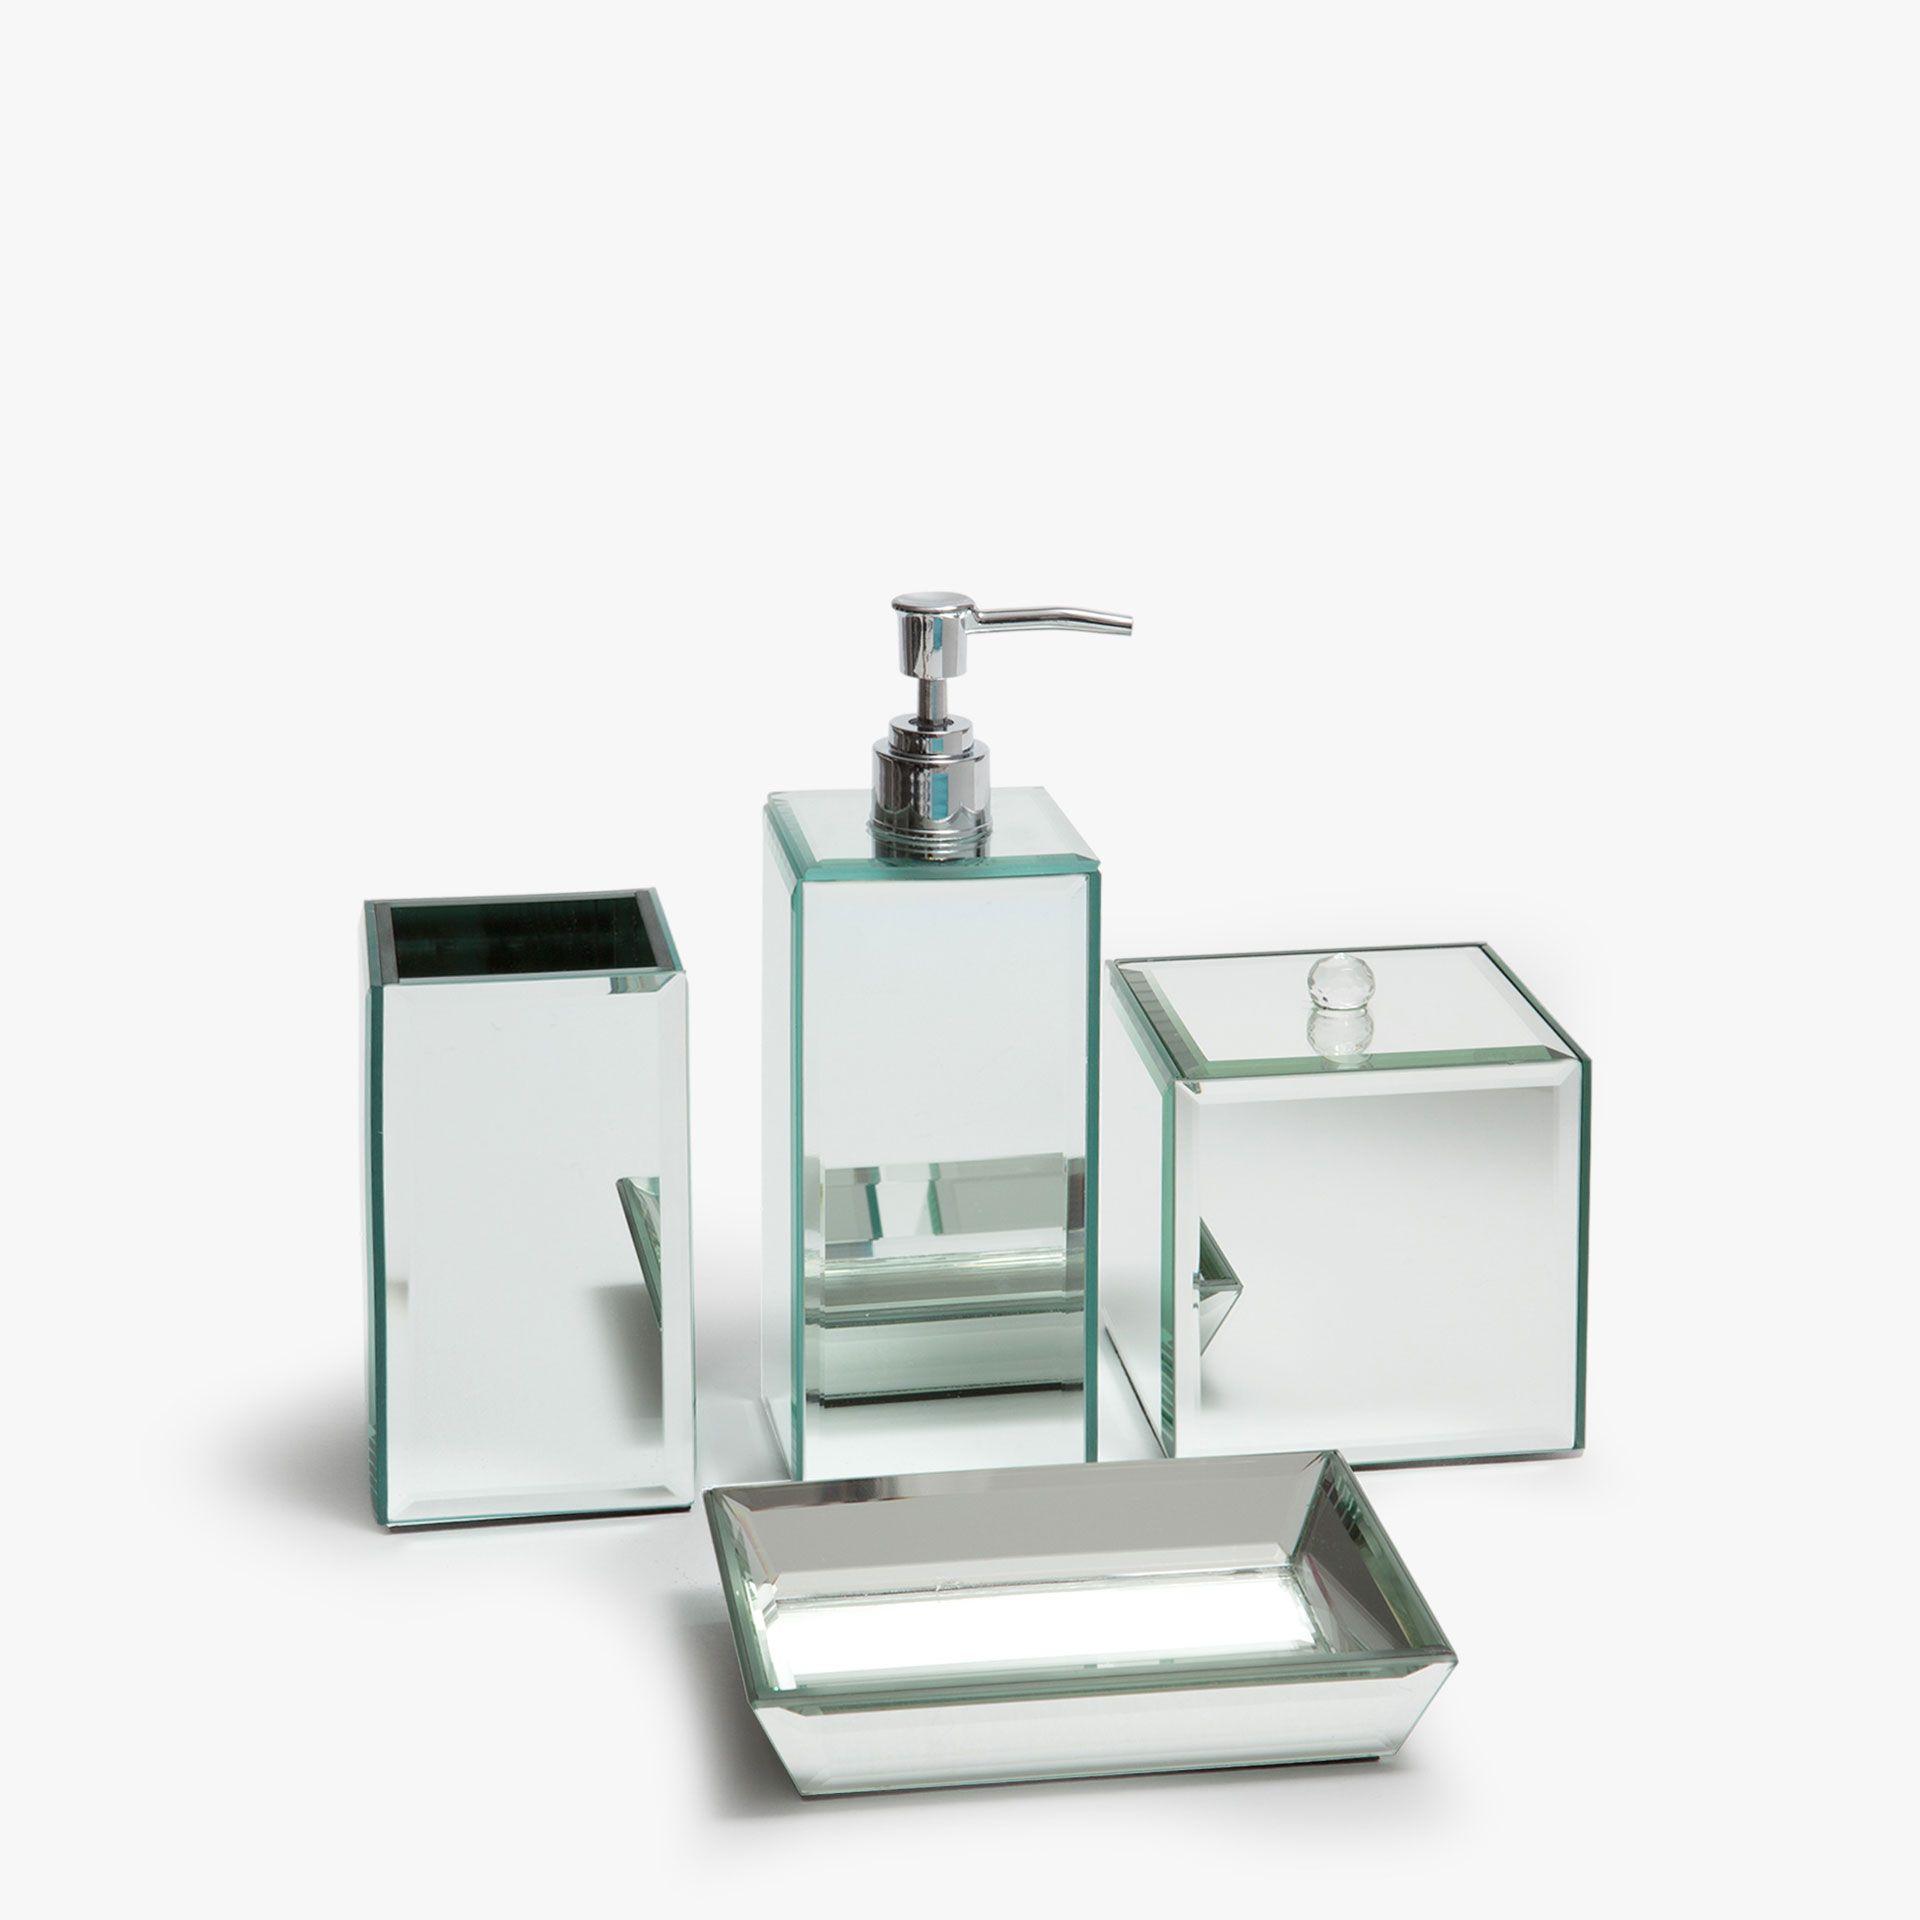 Accesorios De Bano Espejo Accesorios De Bano Bano Zara Home